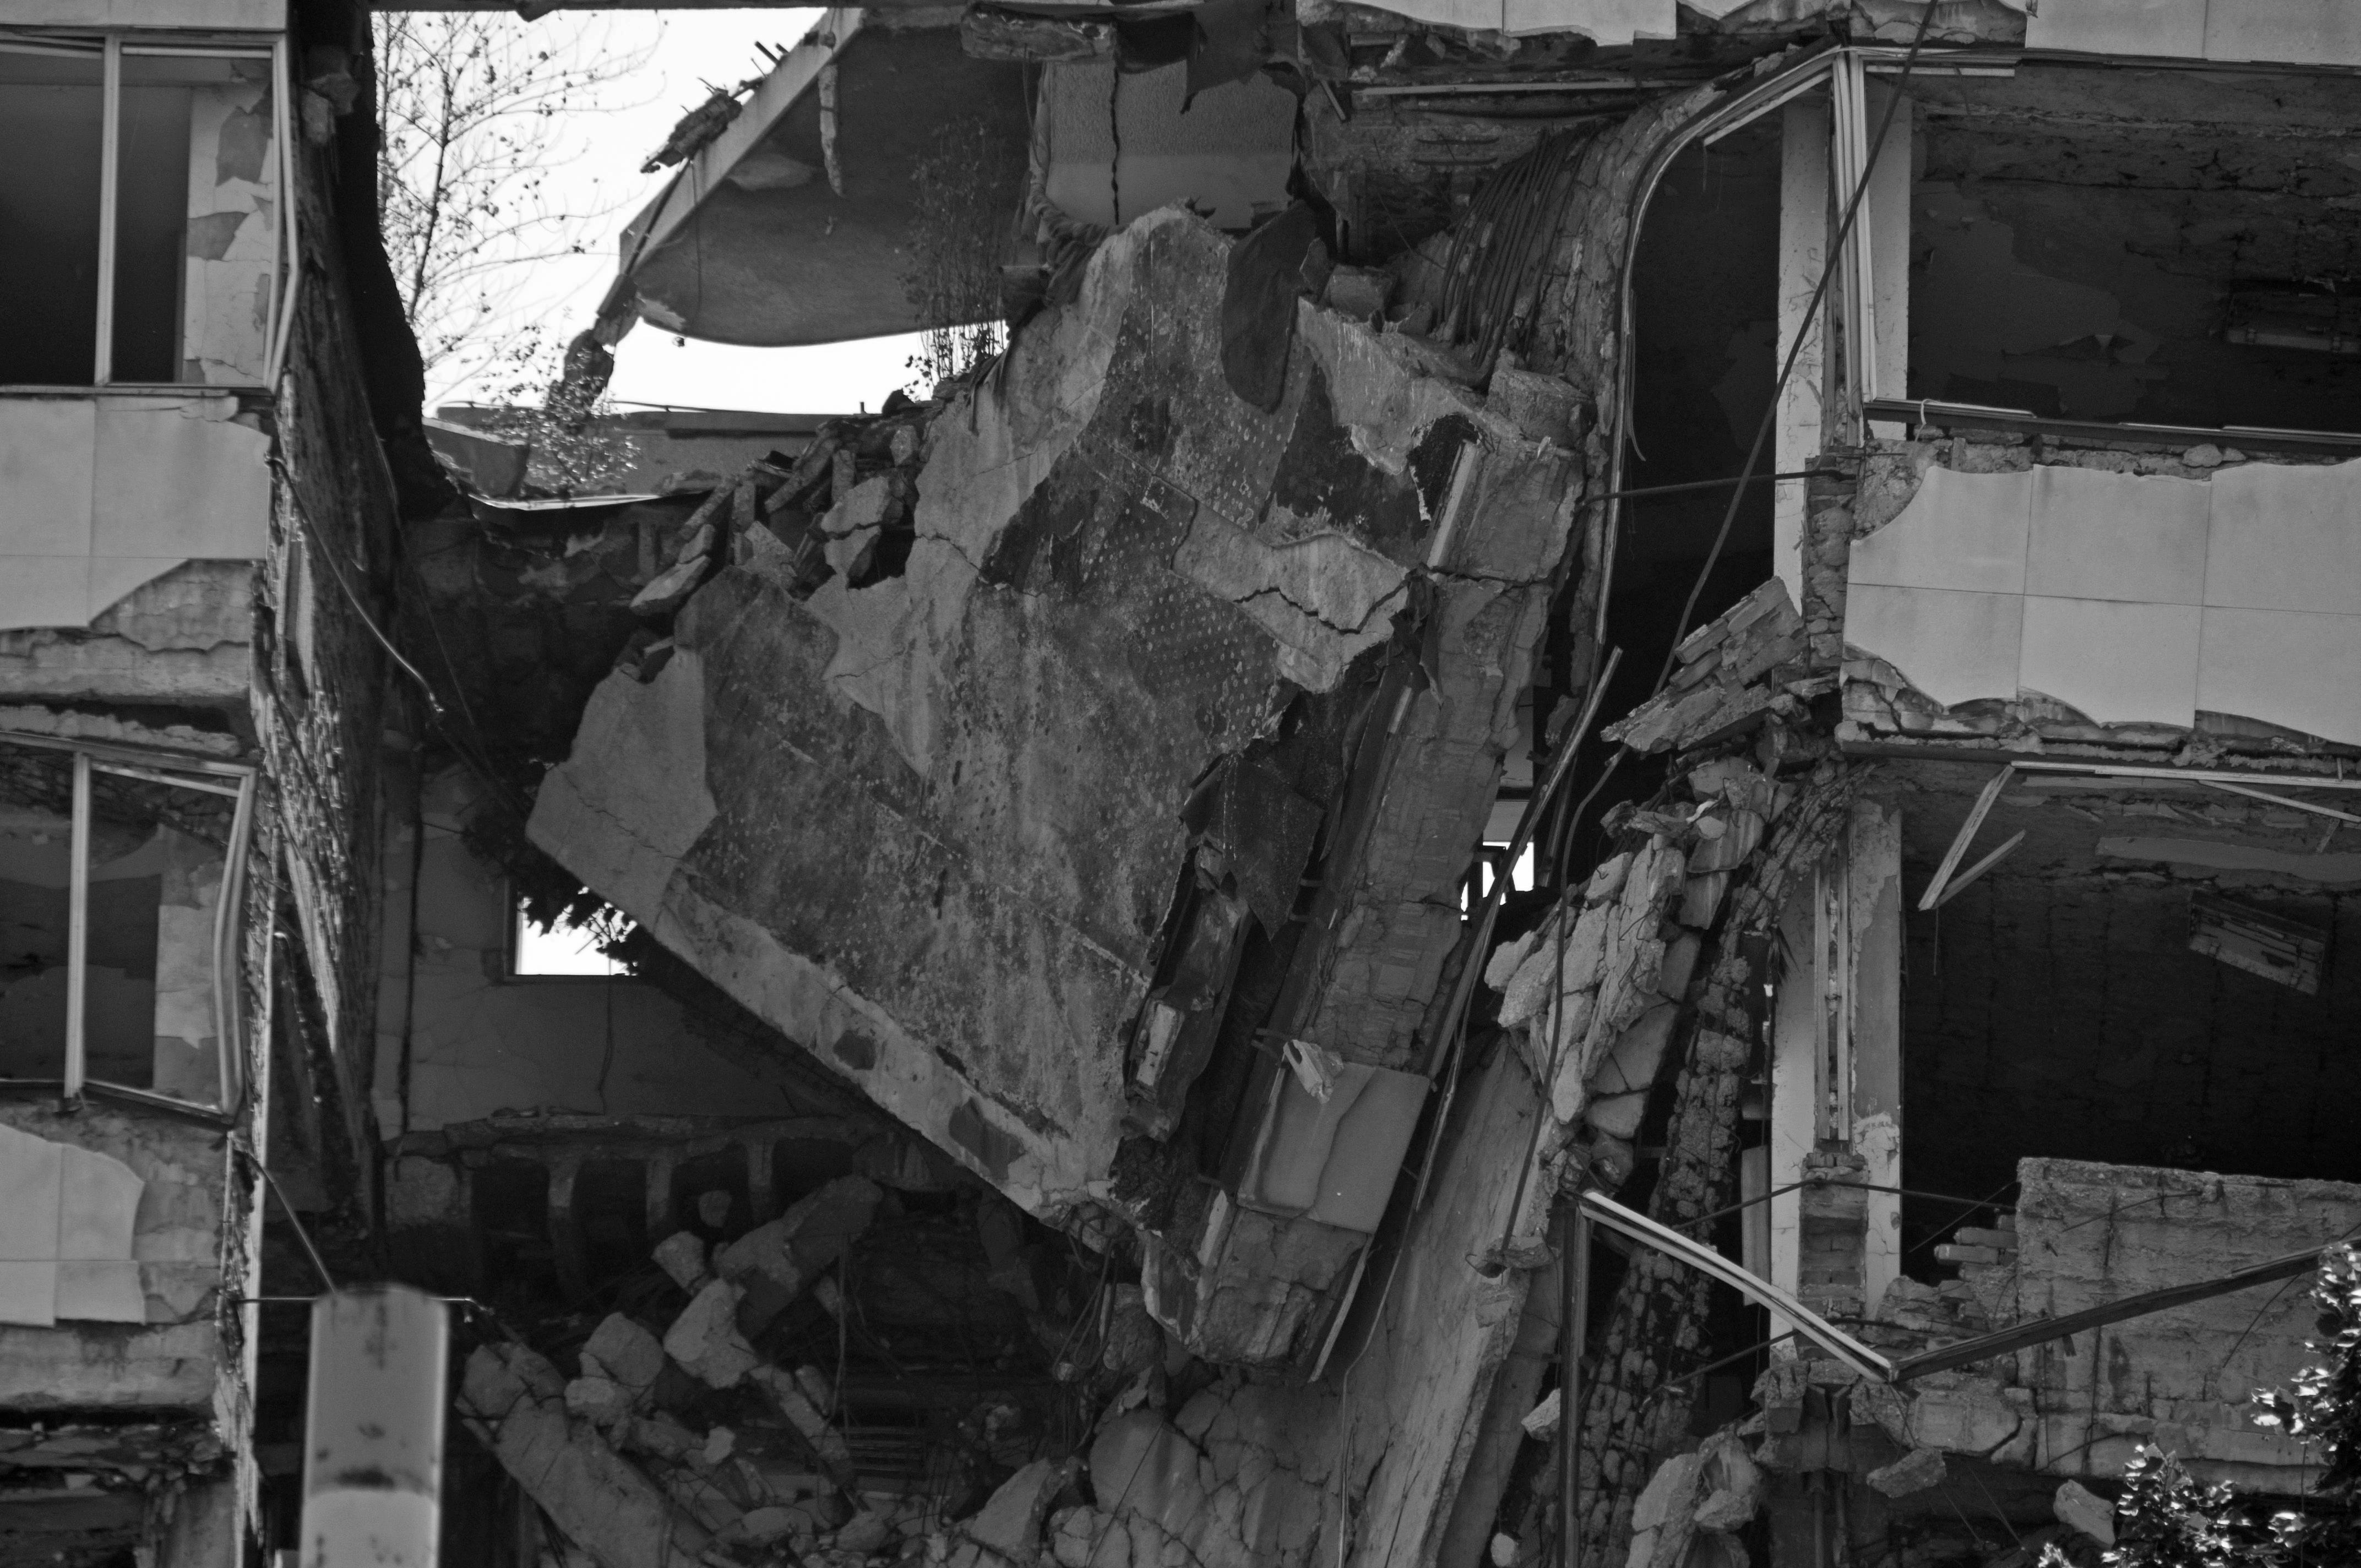 9 juancarlosgarcialorenzo-photography-flickr-serbia-belgrade-knezamiloša-ministryofinternalaffairsbombedbynatoin1999